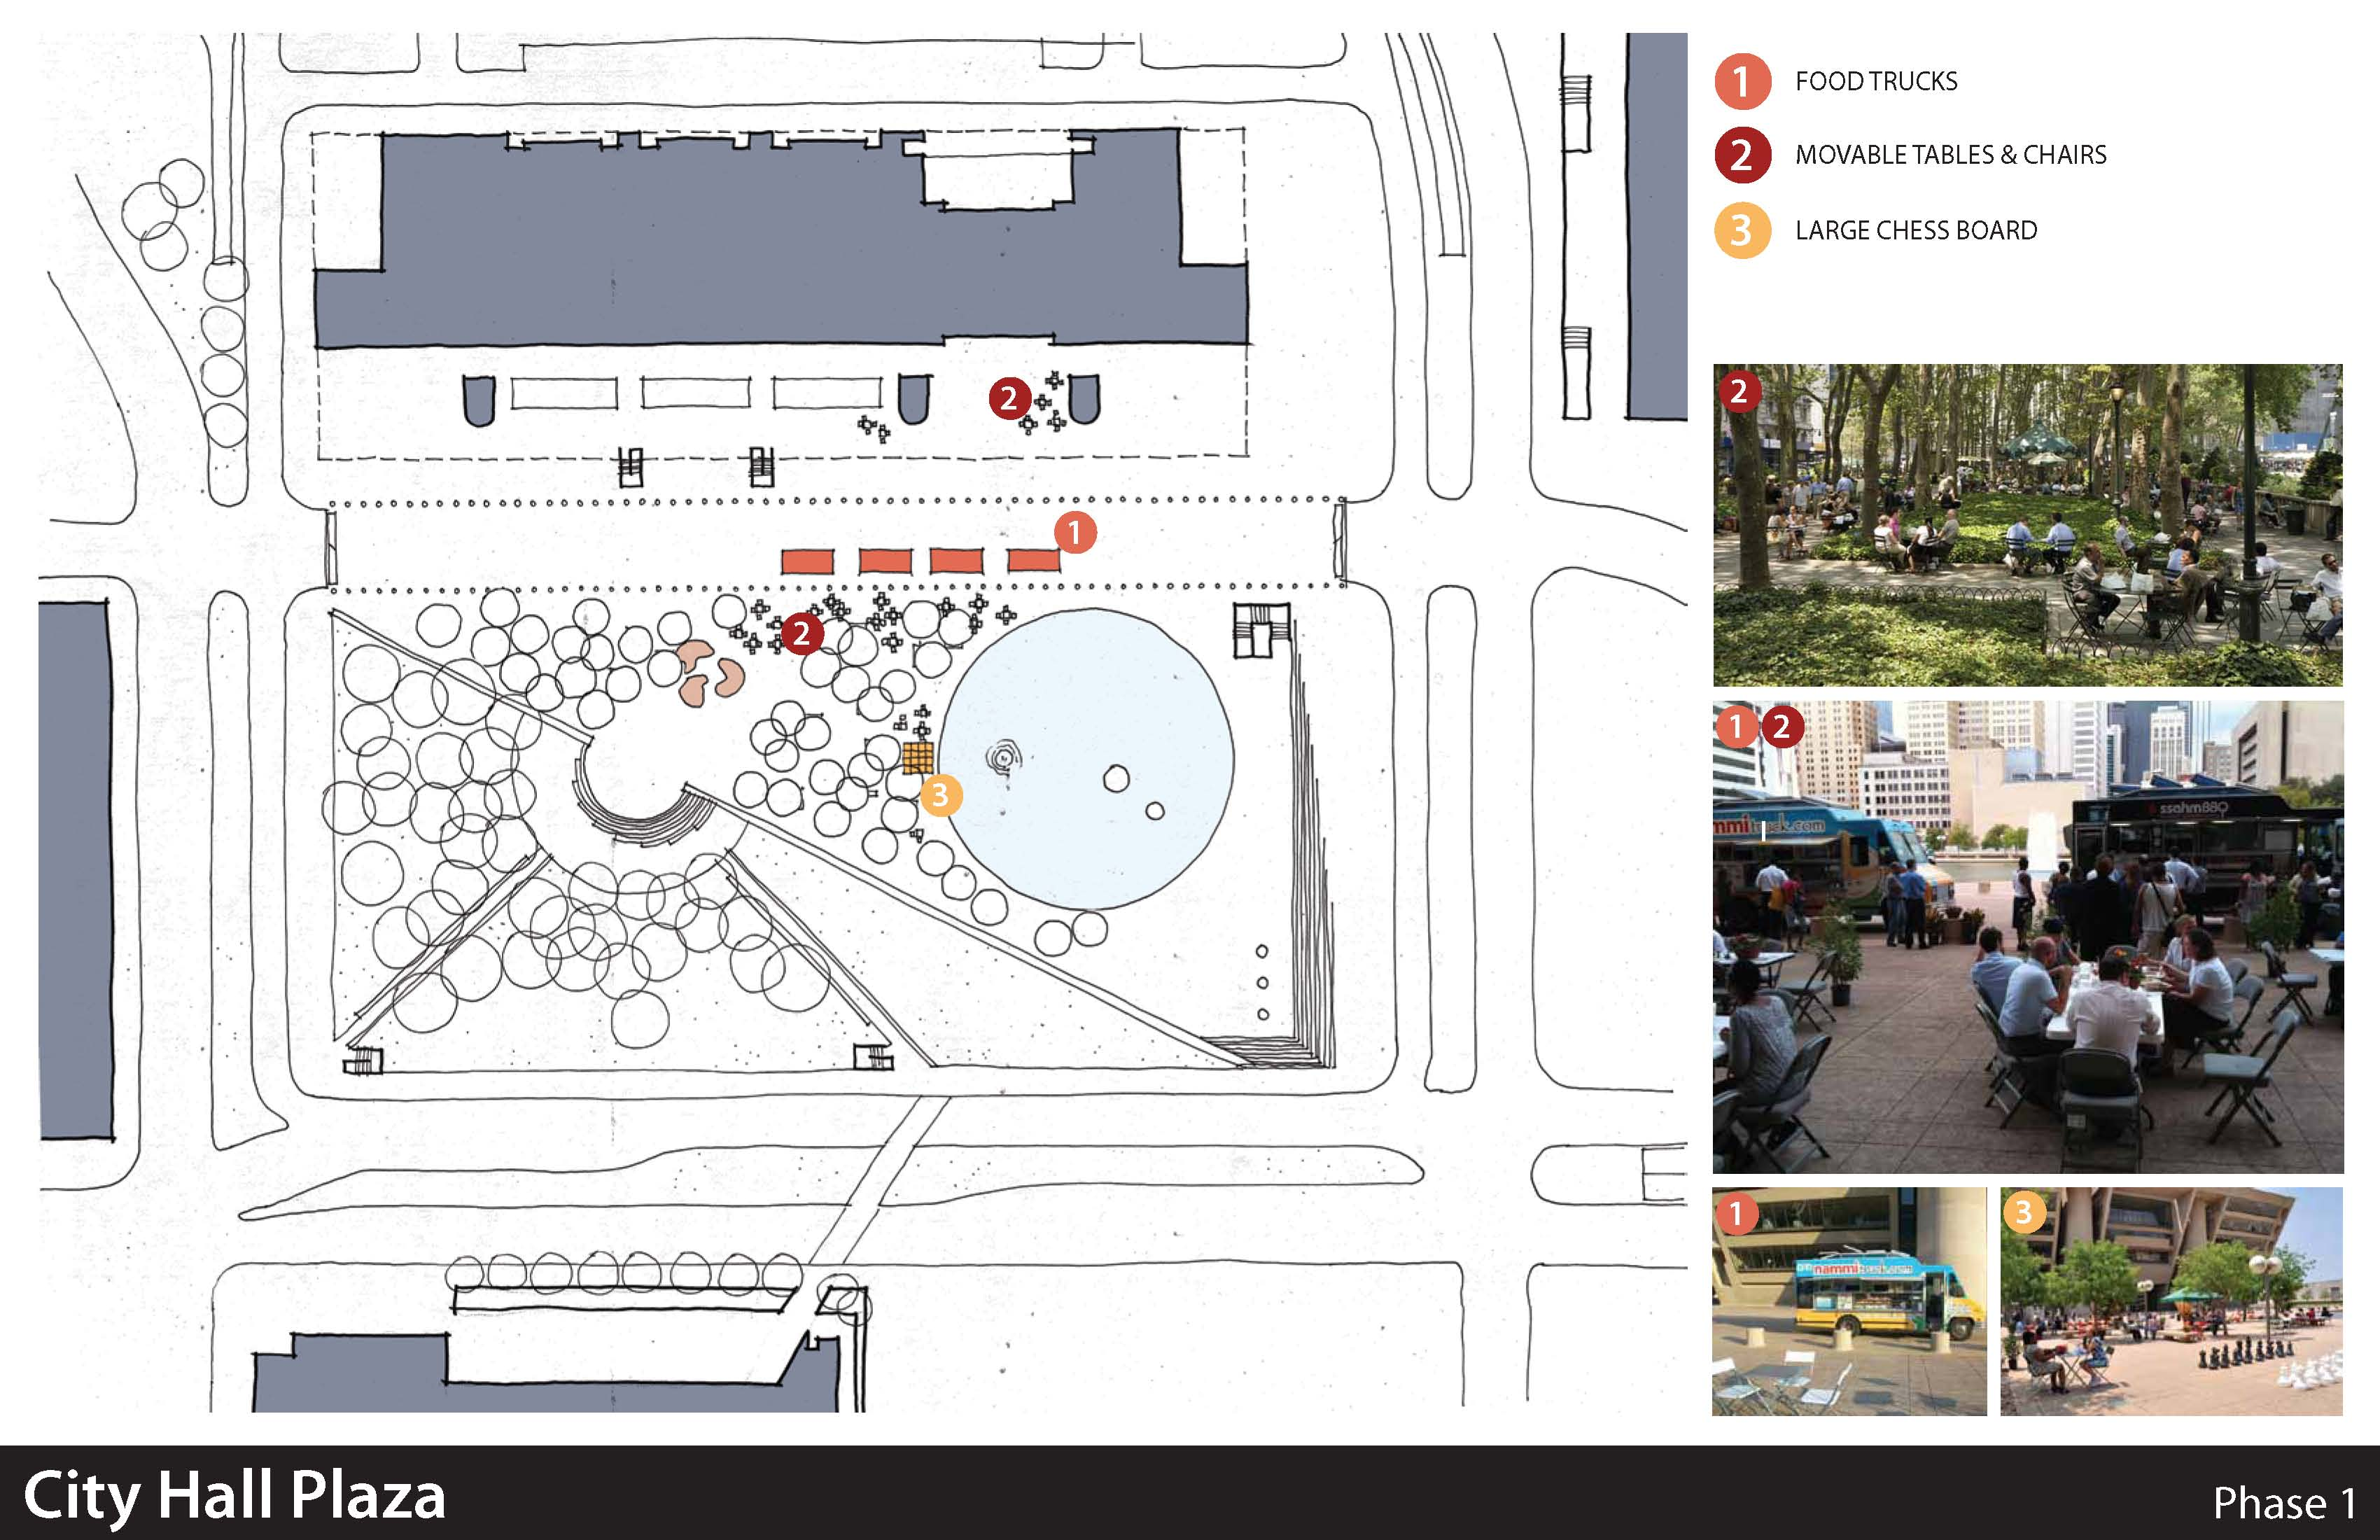 Dallas city hall plaza schemes dreams friends of living plaza phase 1 design aiddatafo Choice Image